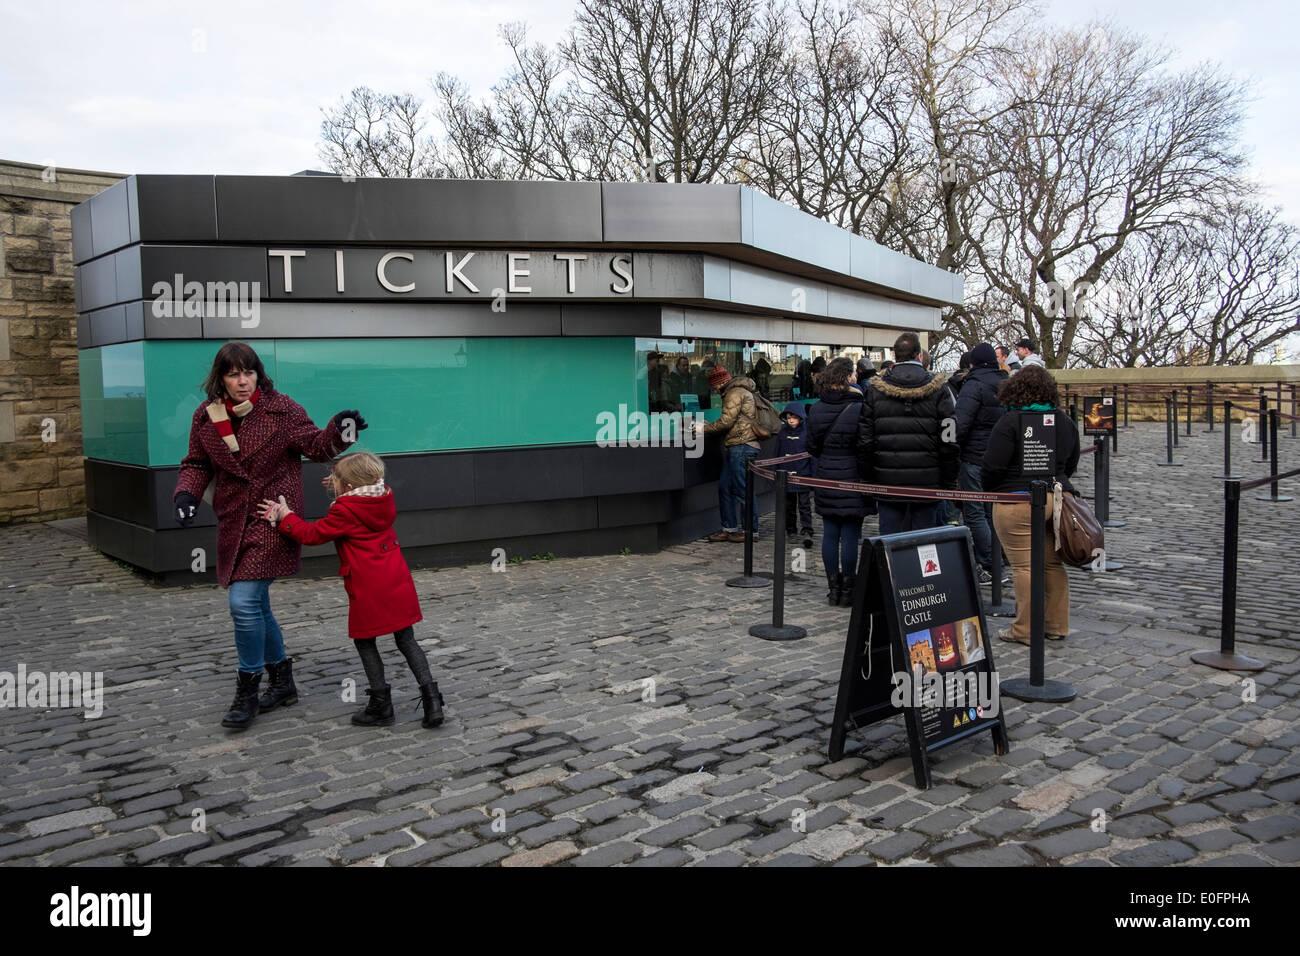 Edinburgh castle tourists tickets touristic place - Stock Image